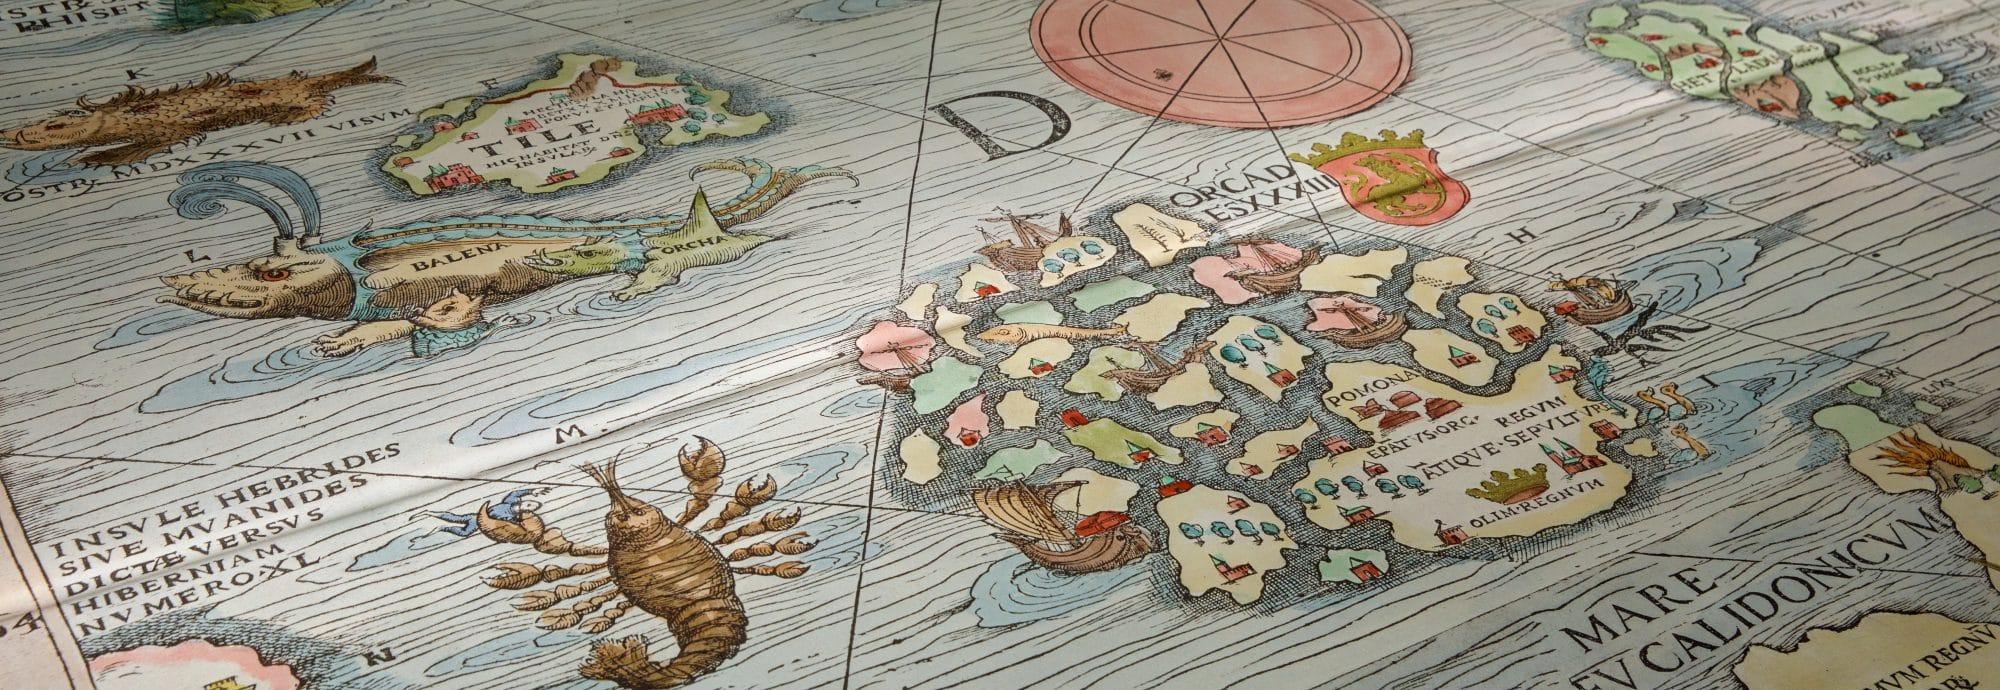 Monsters of the Deep Carta Marina Map